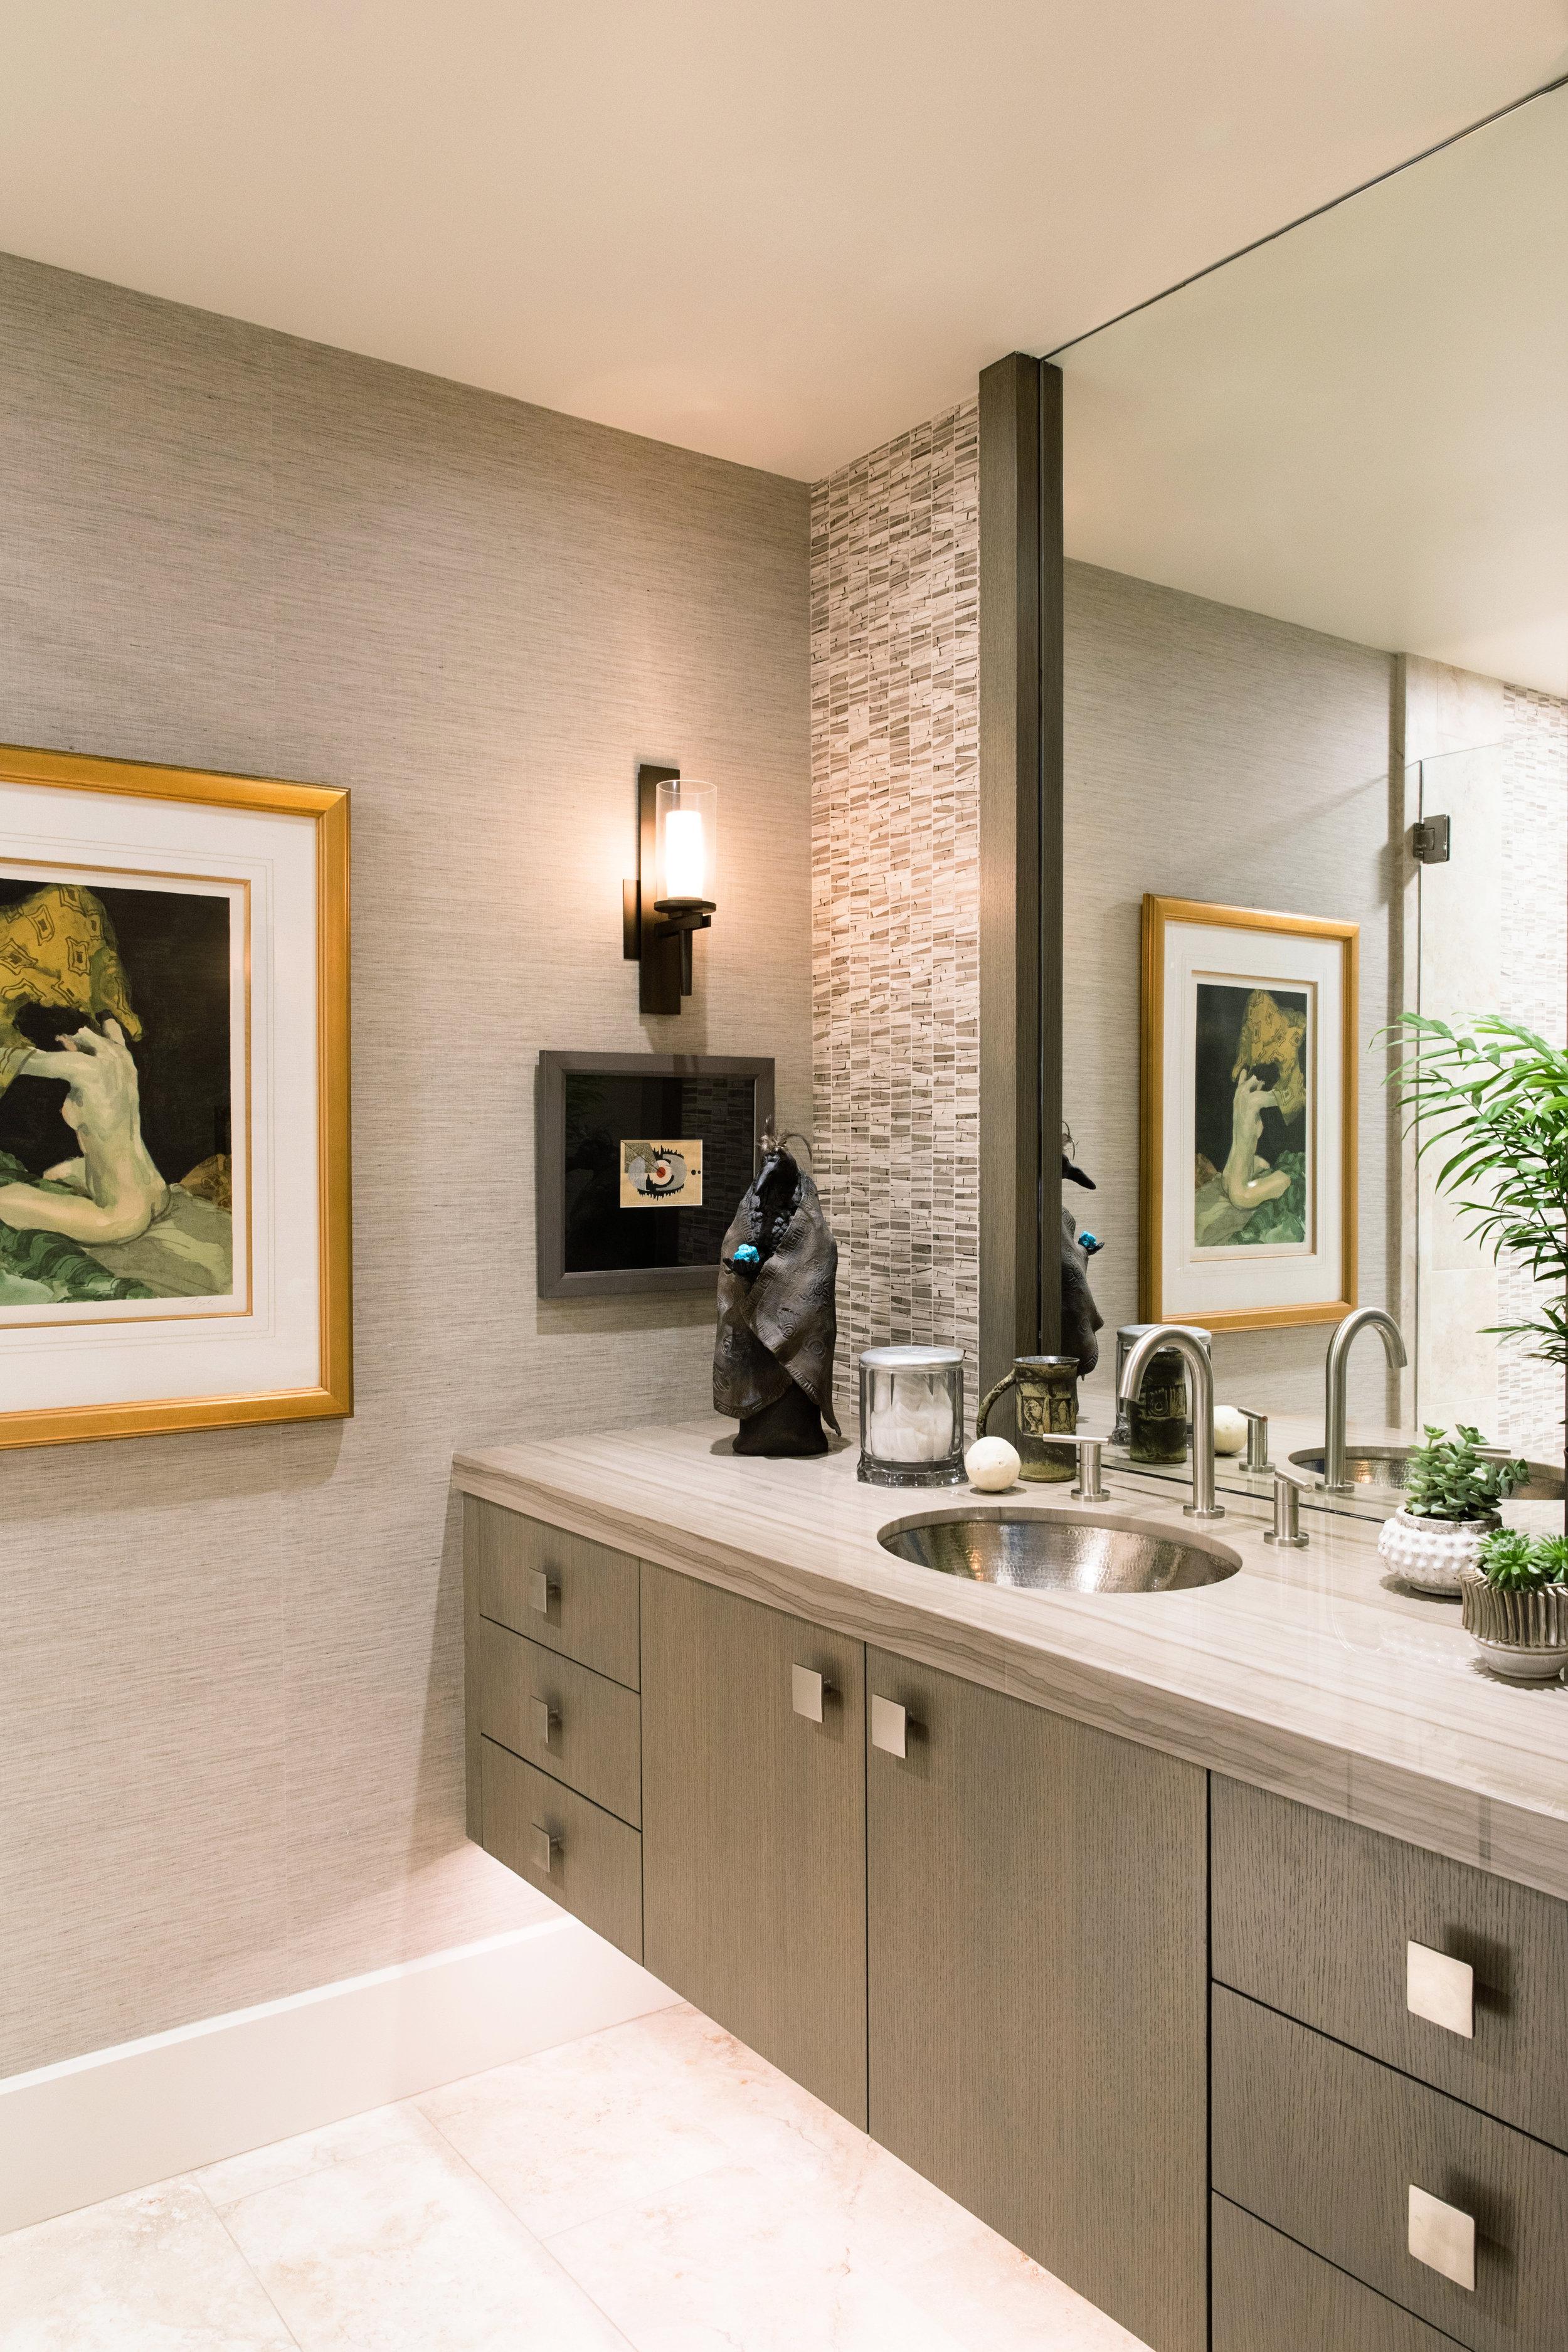 Fine art enlivens the modern guest bath.